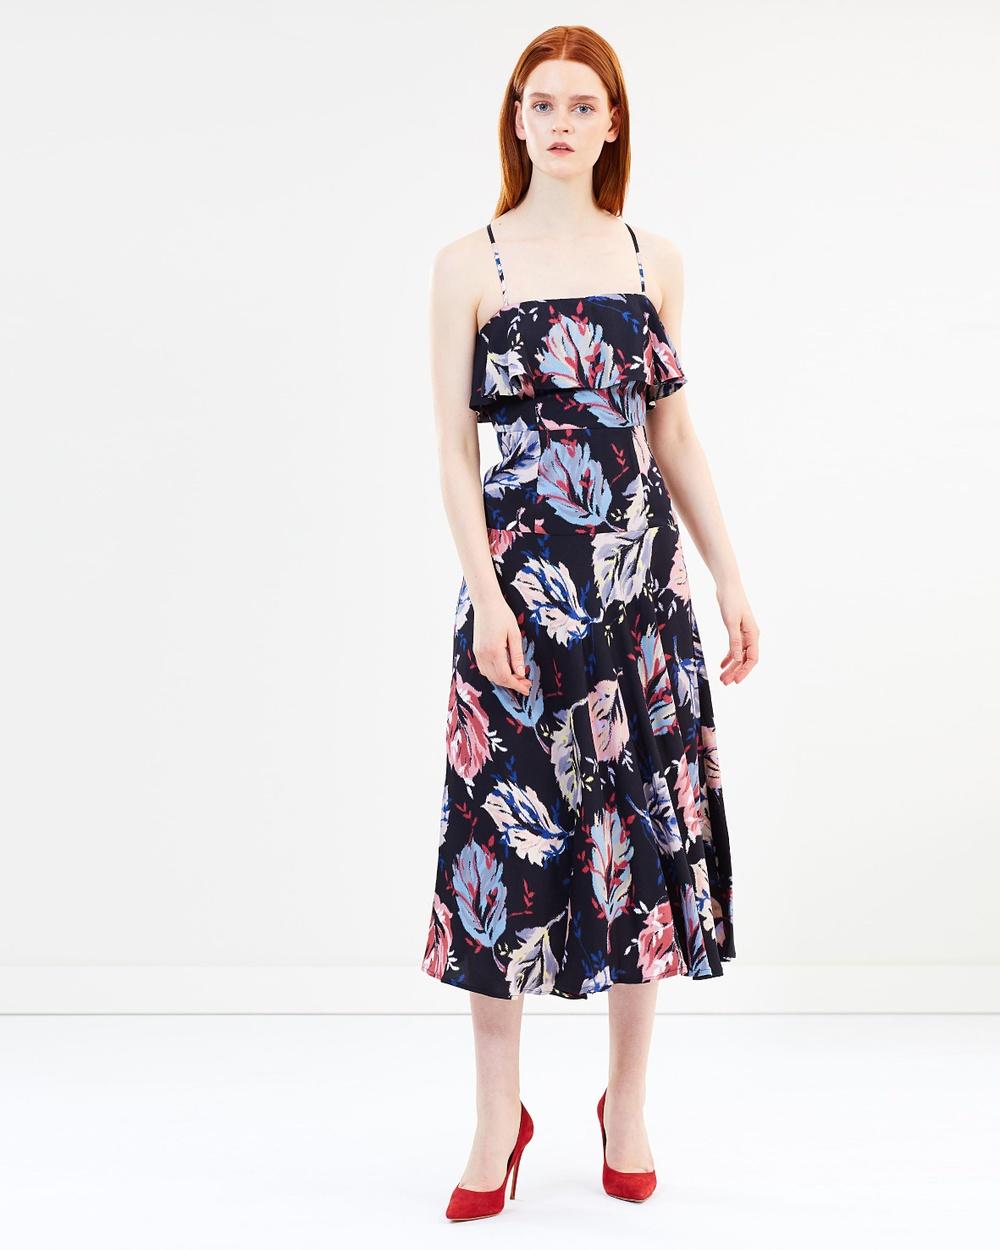 MAX & Co. Paino Dress Printed Dresses Black Pattern Paino Dress